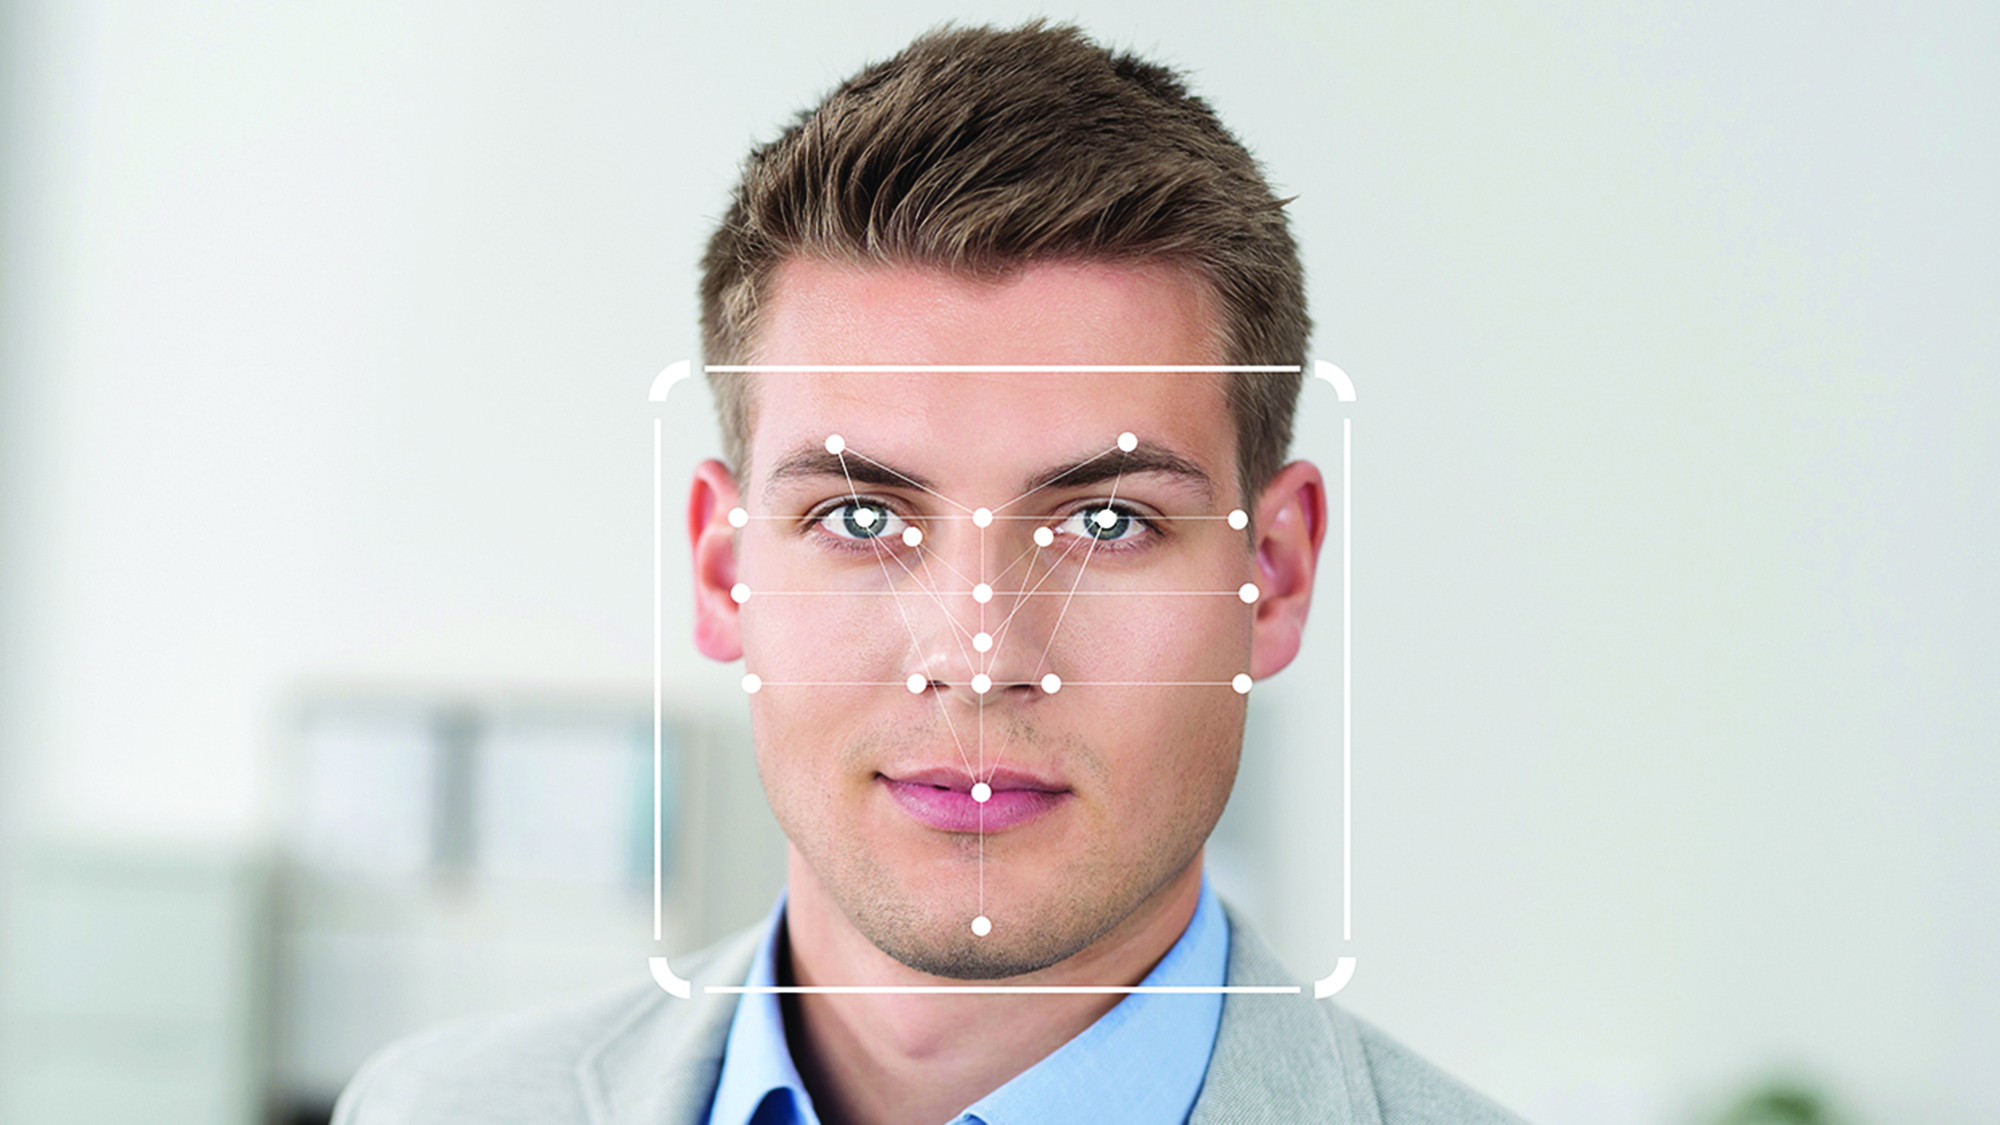 Biometrics  Facial Recognition Tech Coming To An Airport